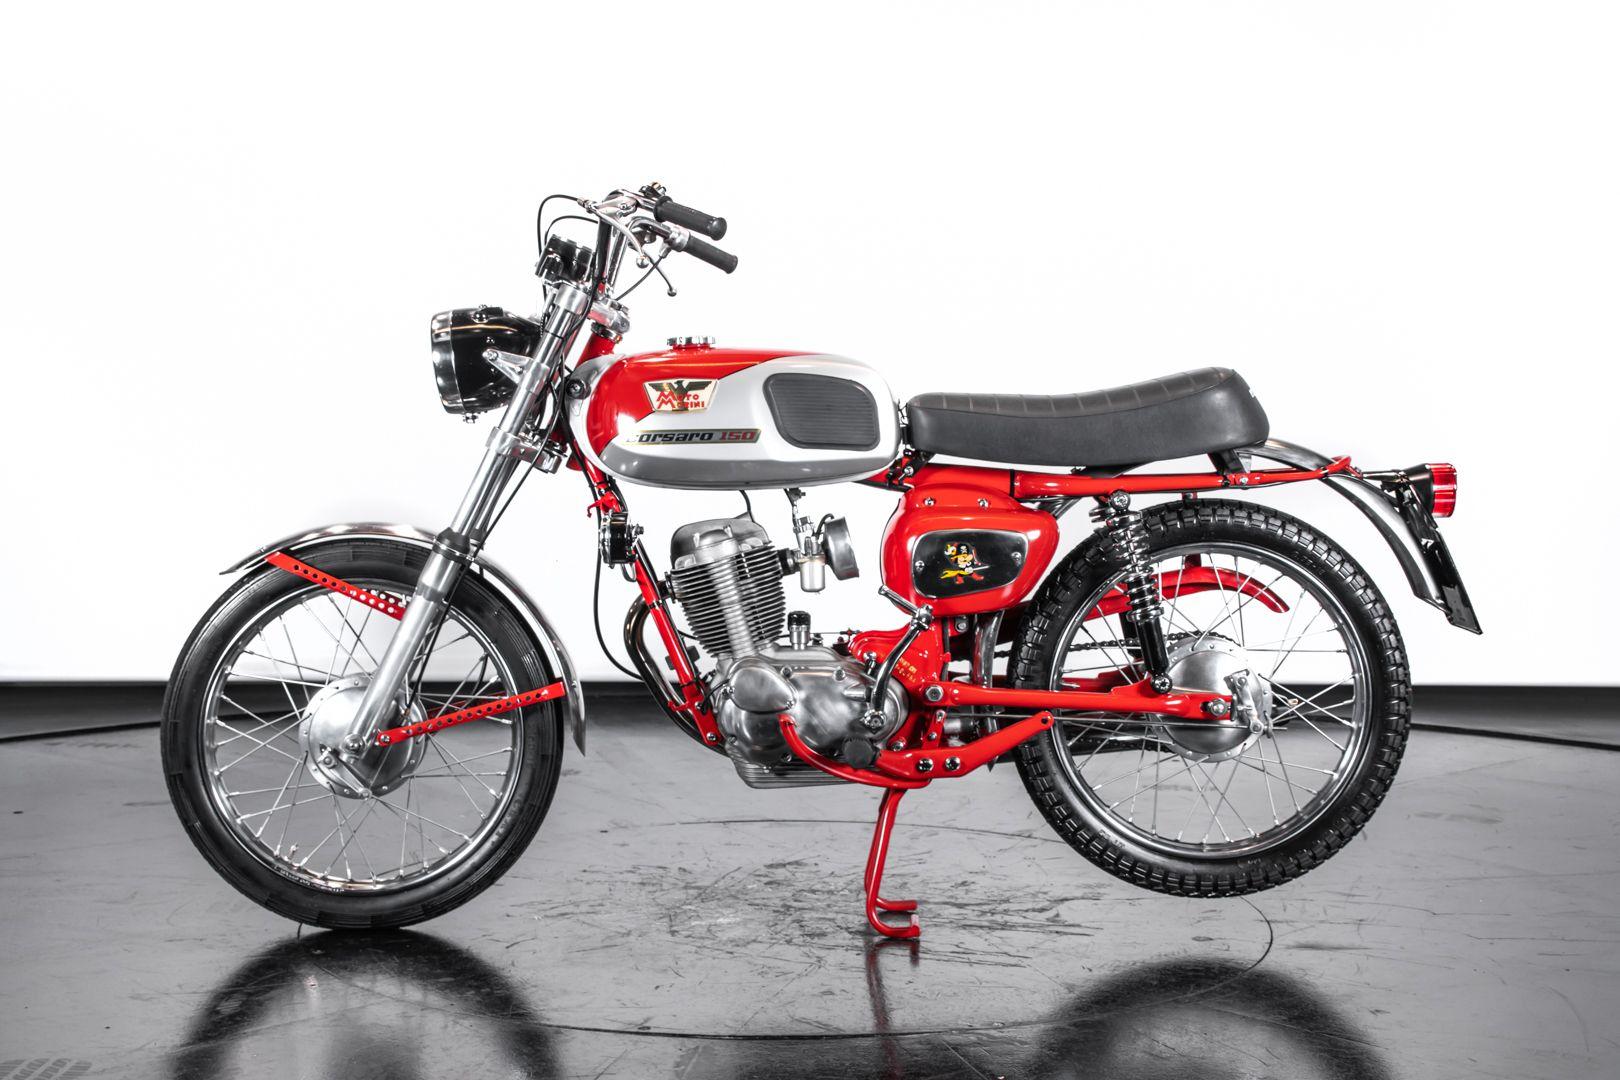 1971 Moto Morini Corsaro SS 150 77719